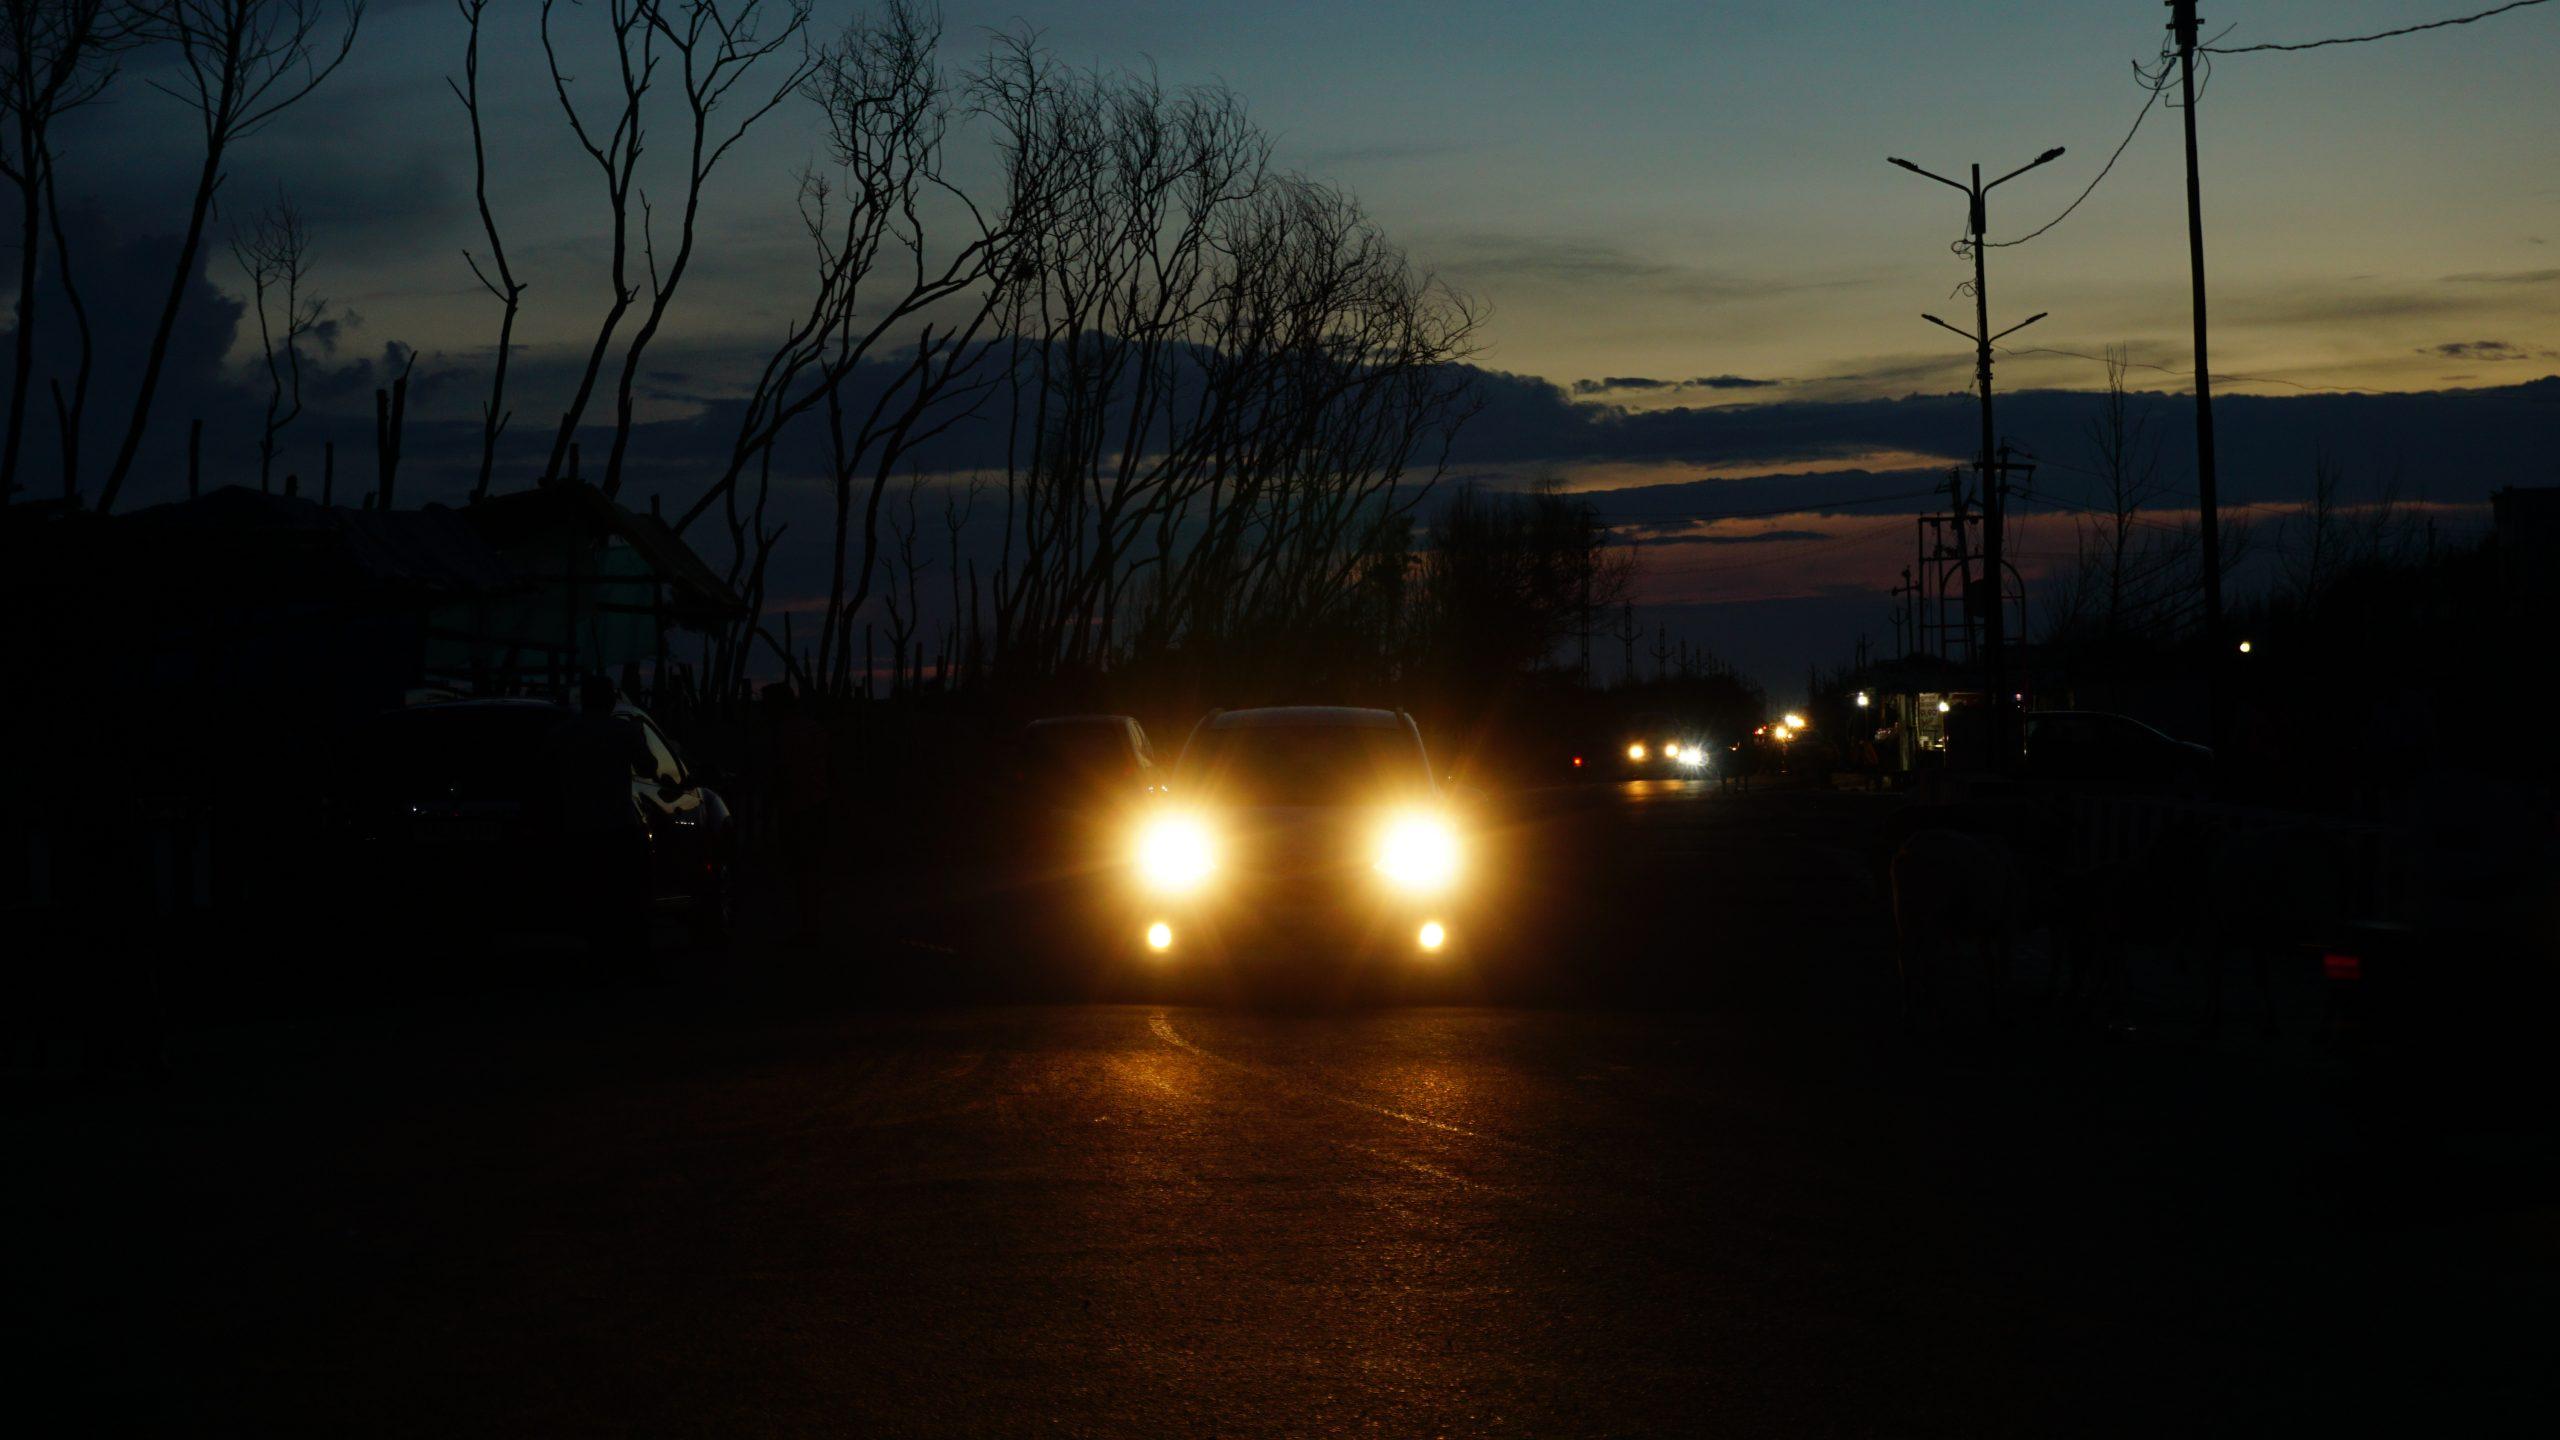 Cars head light in the dark